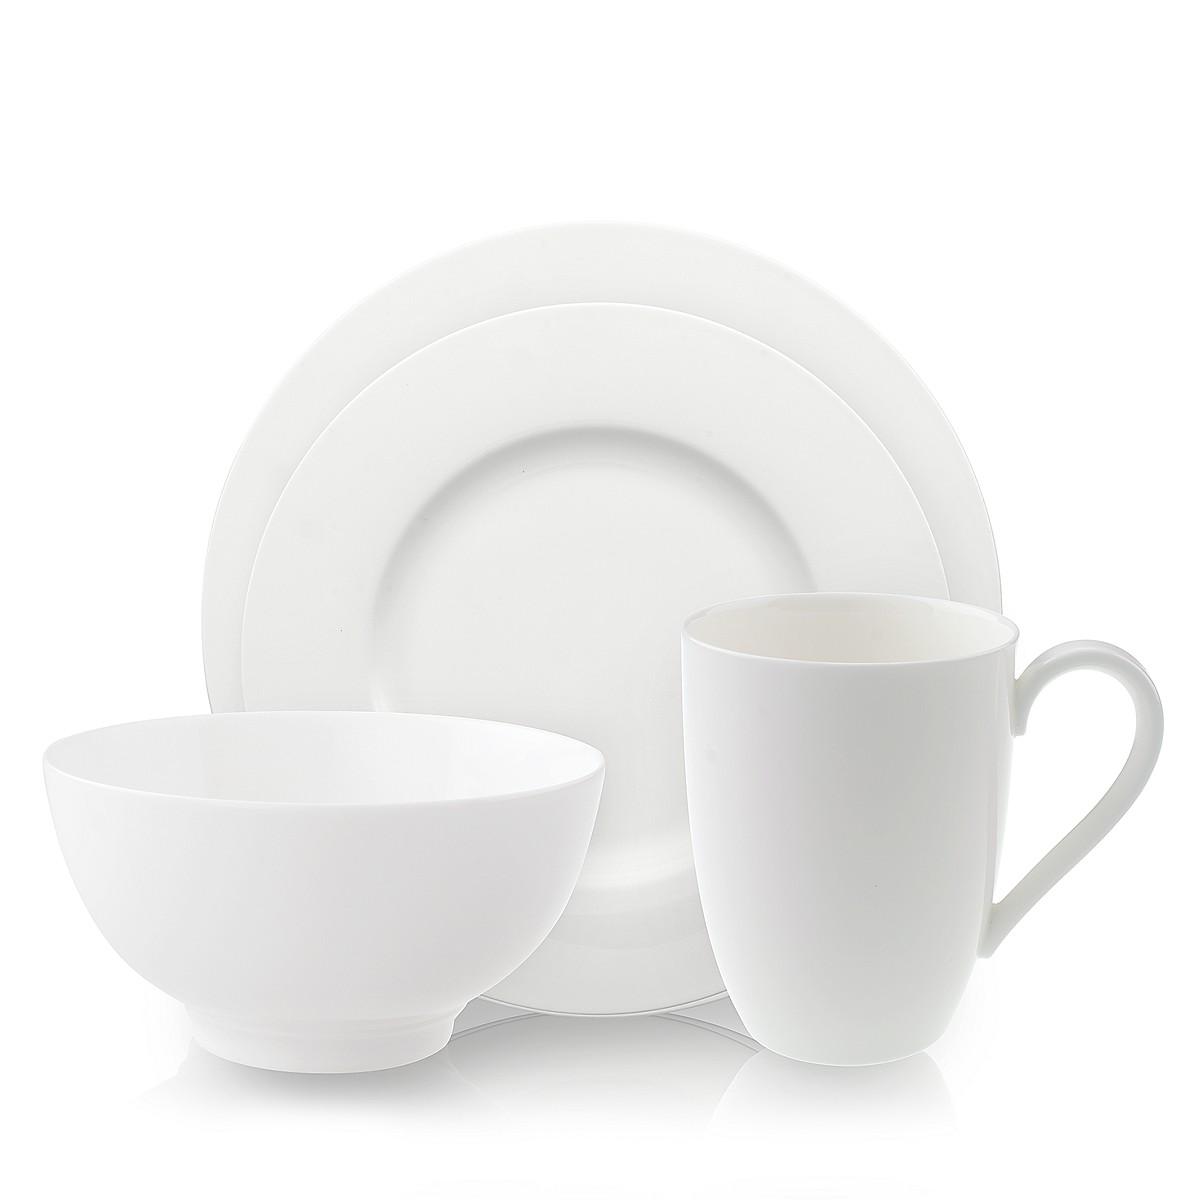 villeroy boch anmut dinnerware bloomingdale 39 s. Black Bedroom Furniture Sets. Home Design Ideas